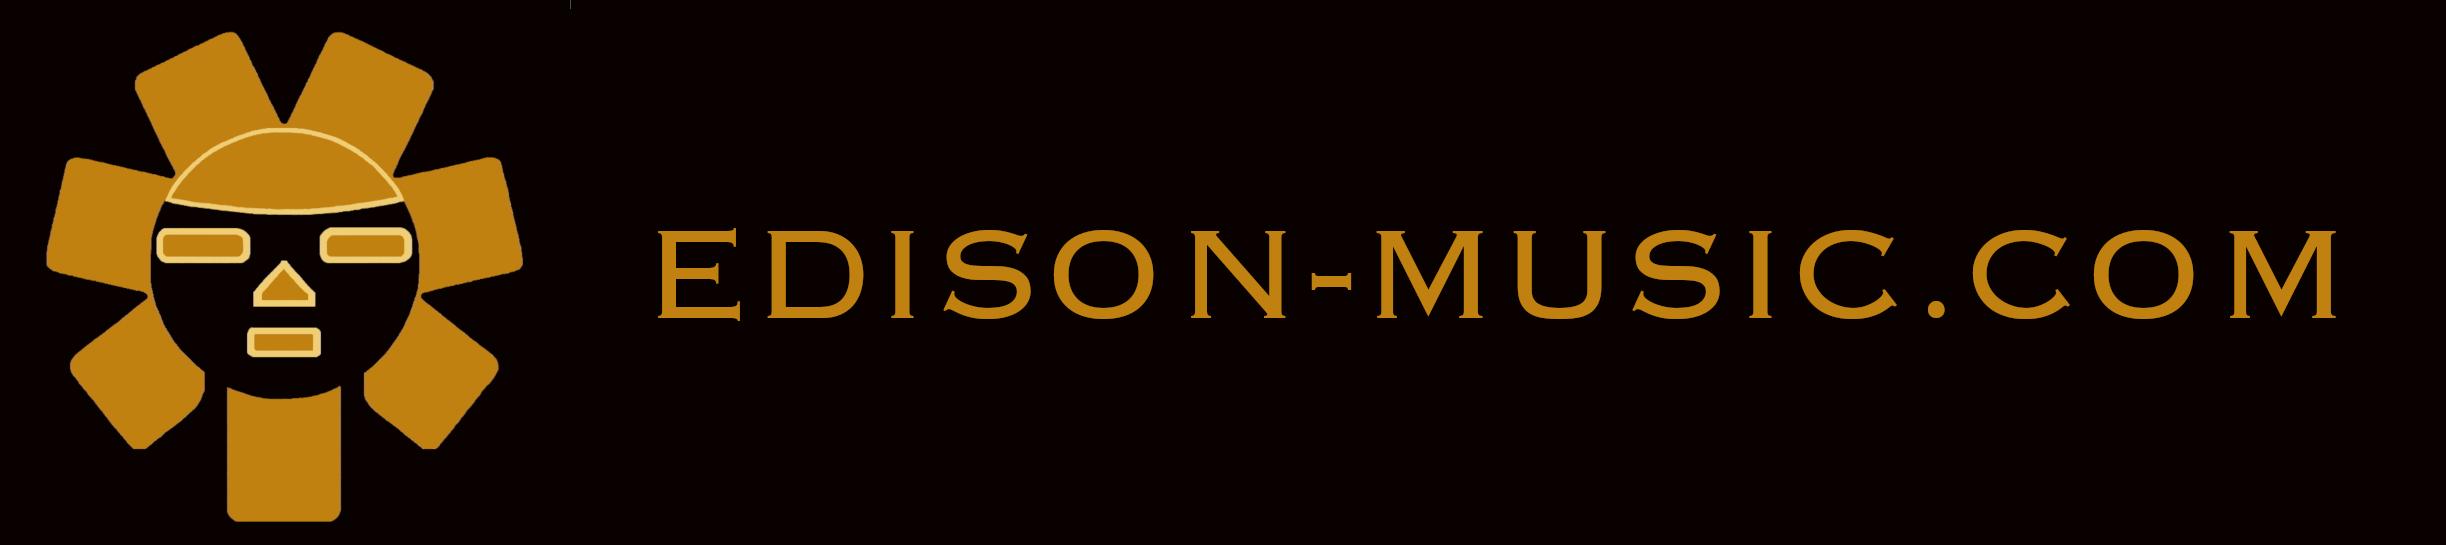 Edison-music